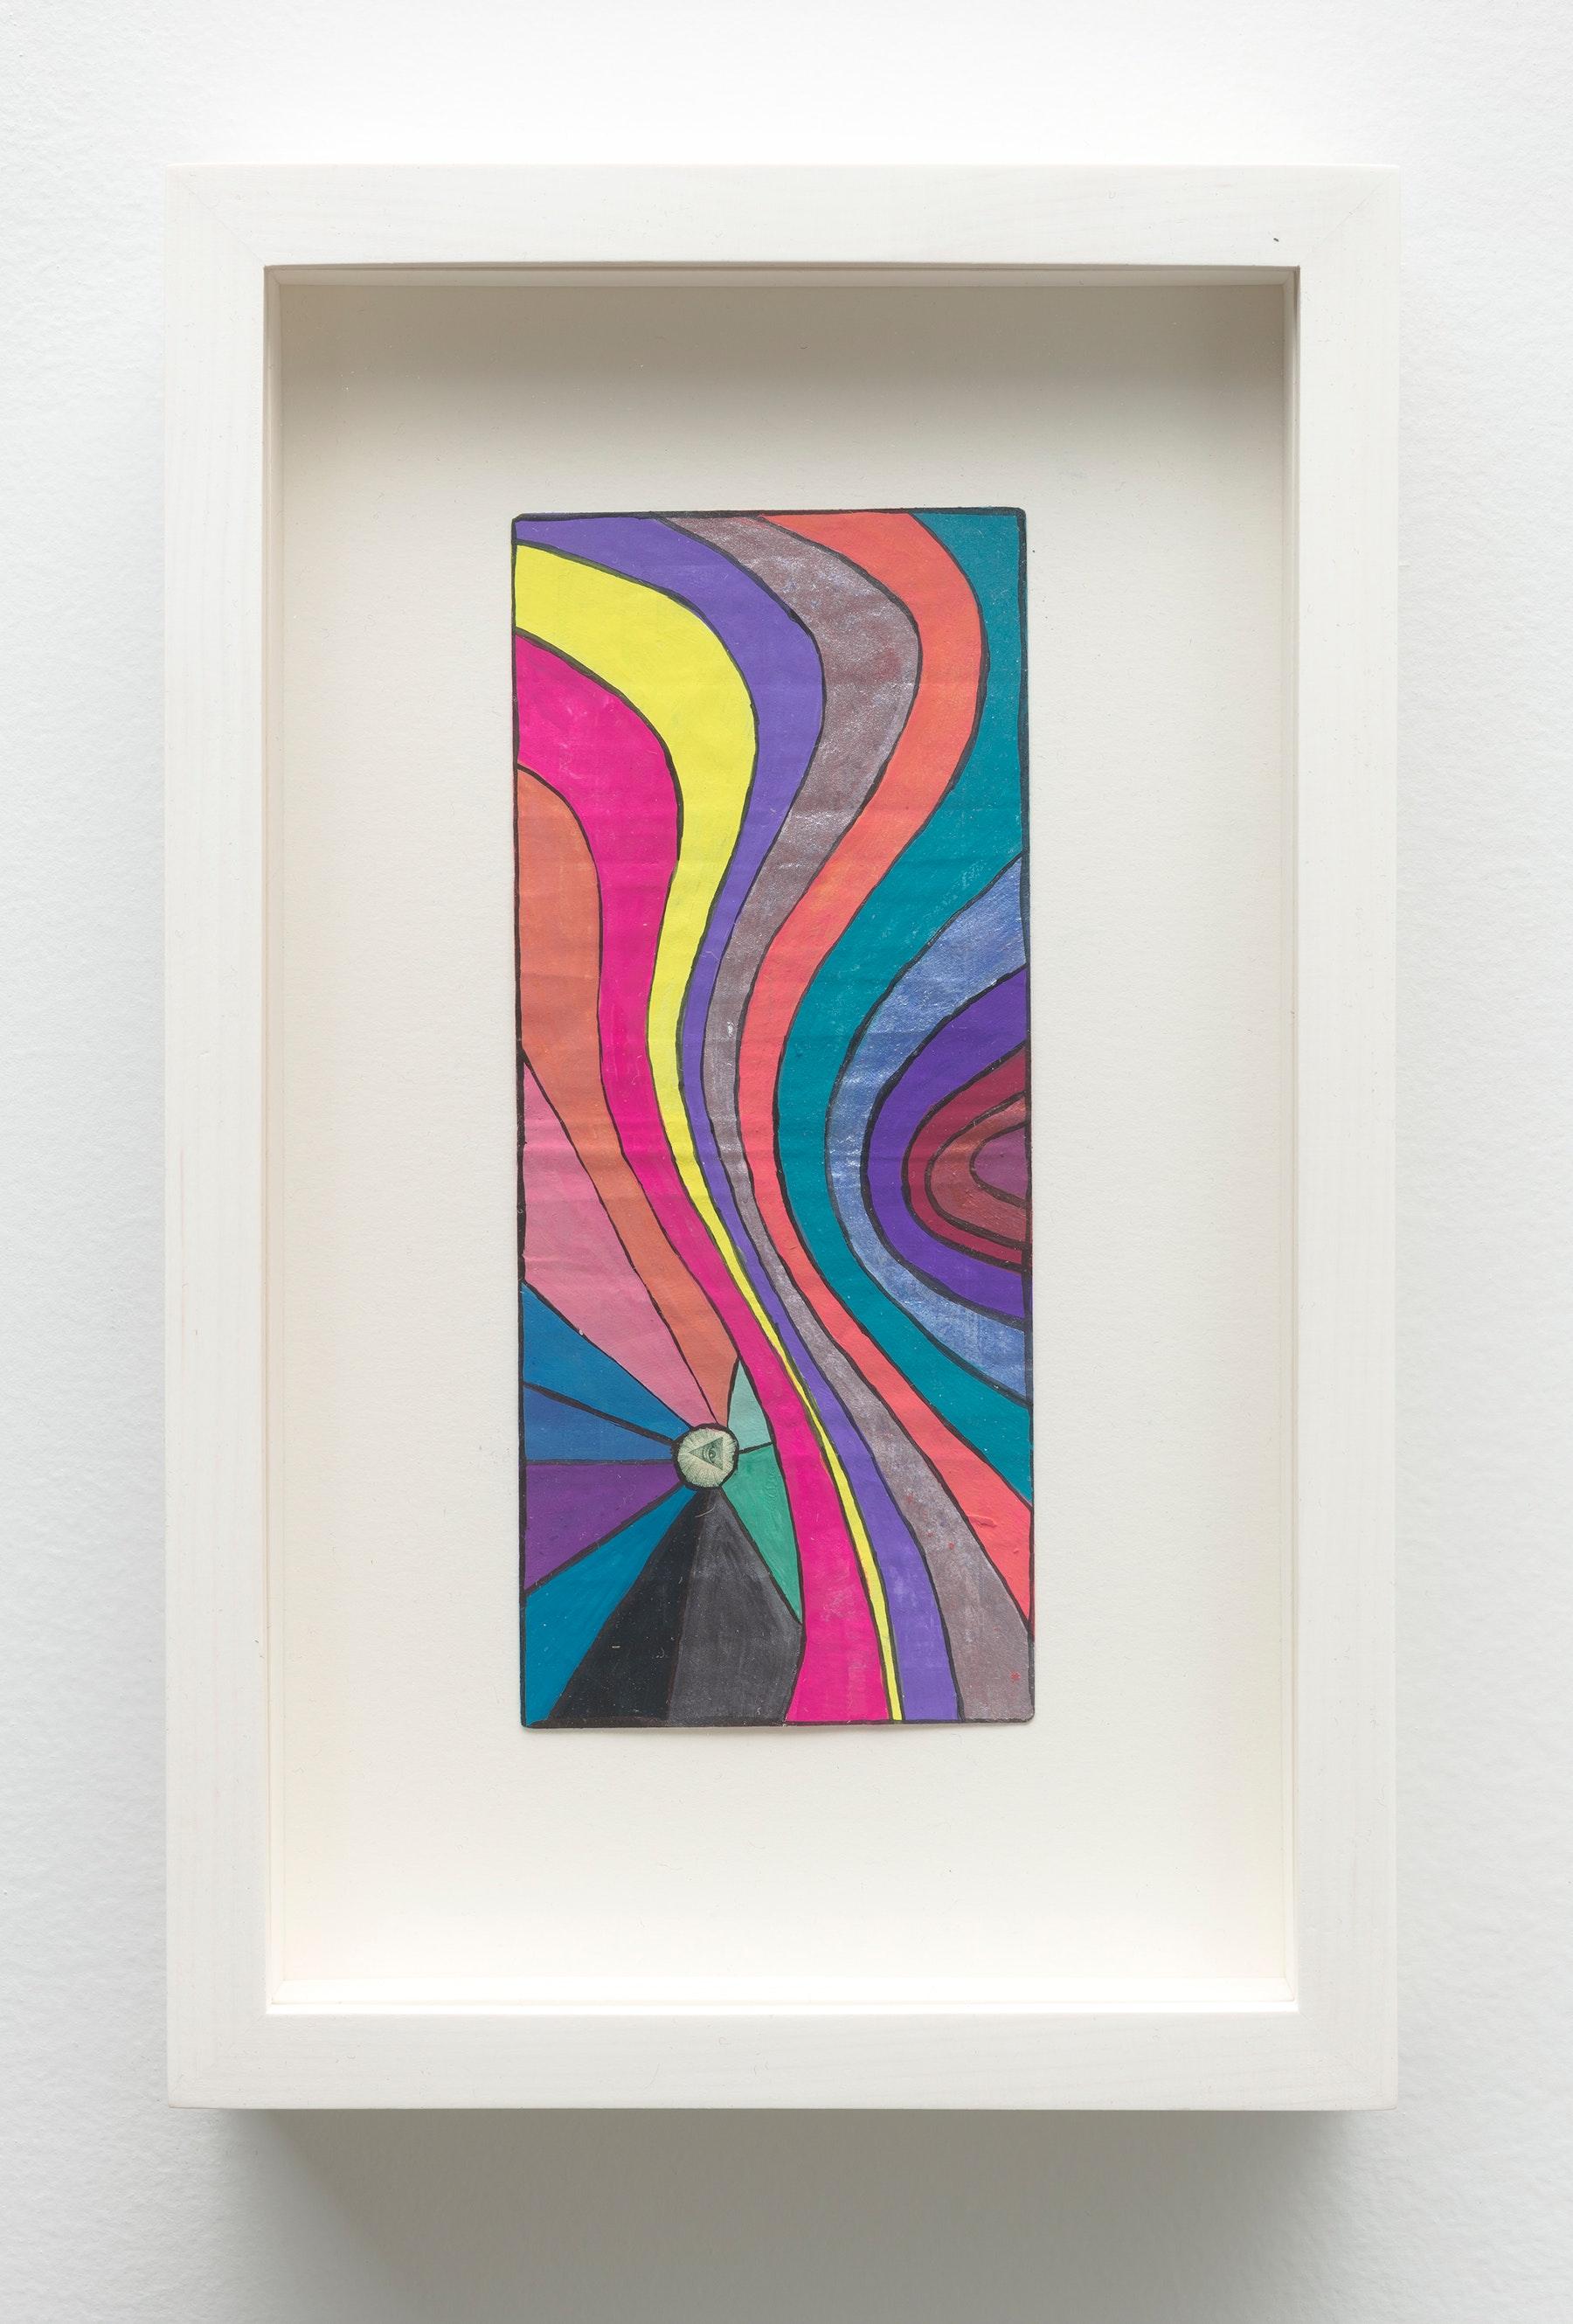 "Sarah Cain ""$ talisman,"" 2019 Acrylic on dollar bill 9.5 x 6.25 x 1.75"" [HxWxD] (24.13 x 15.88 x 4.45 cm) Inventory #CAS139 Courtesy of the artist and Vielmetter Los Angeles Photo credit: Robert Wedemeyer"